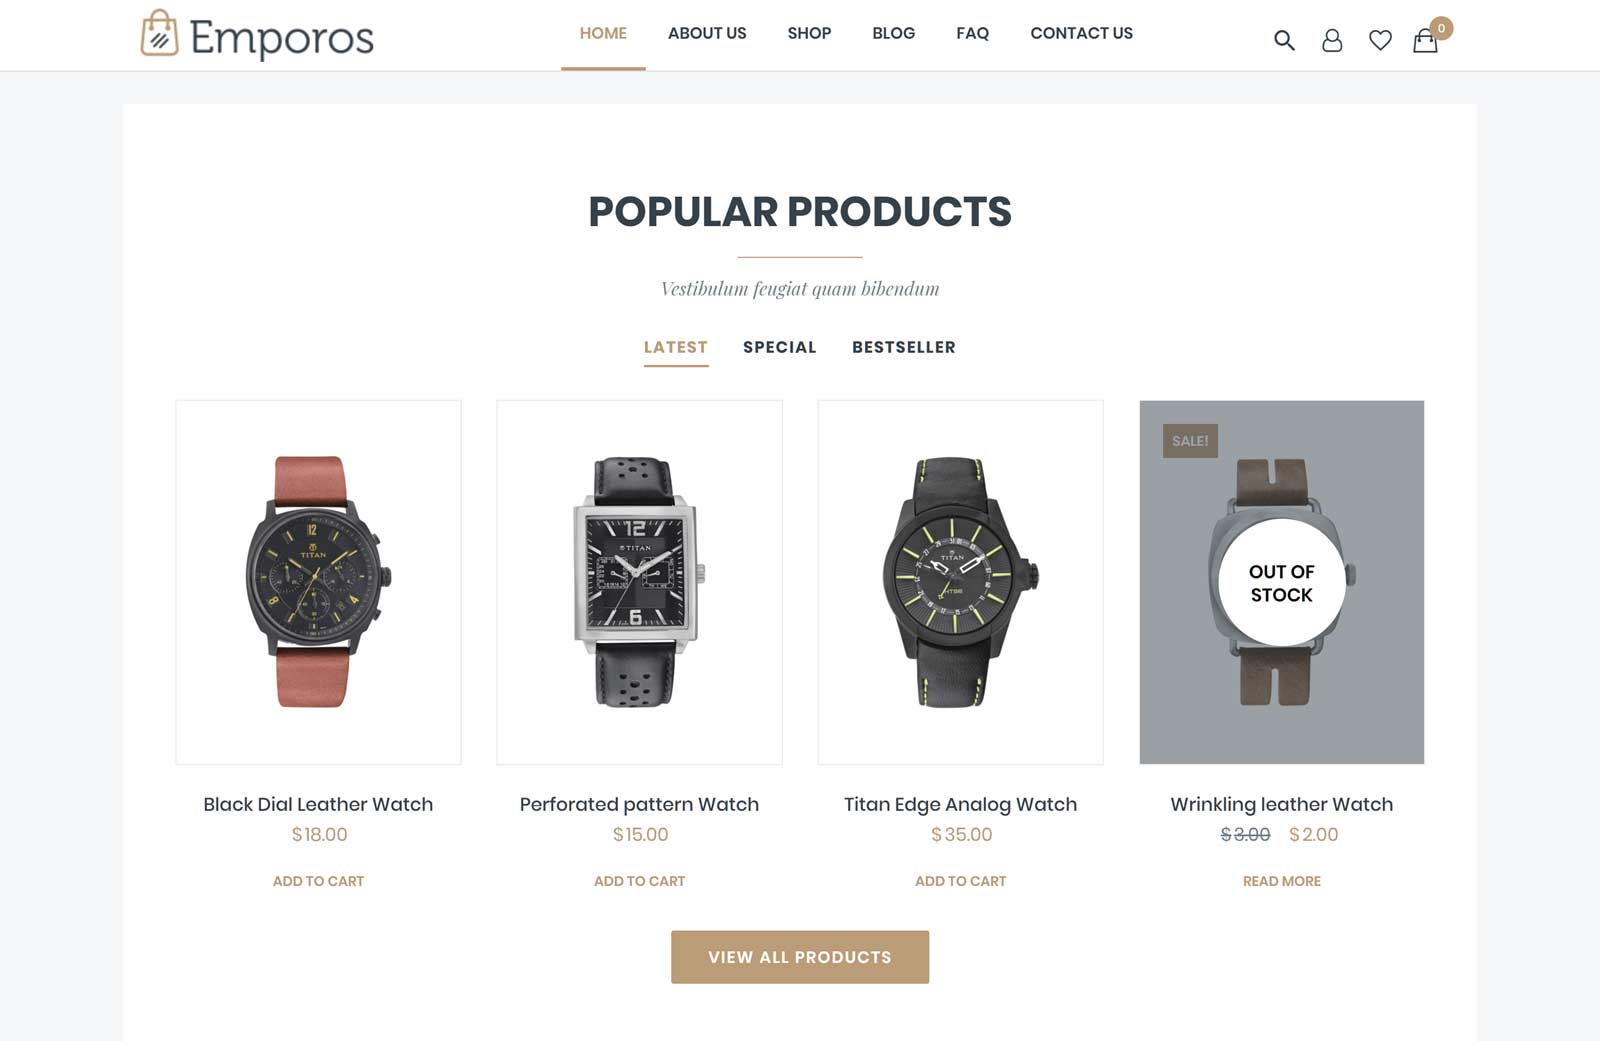 Emporos Theme Product Display